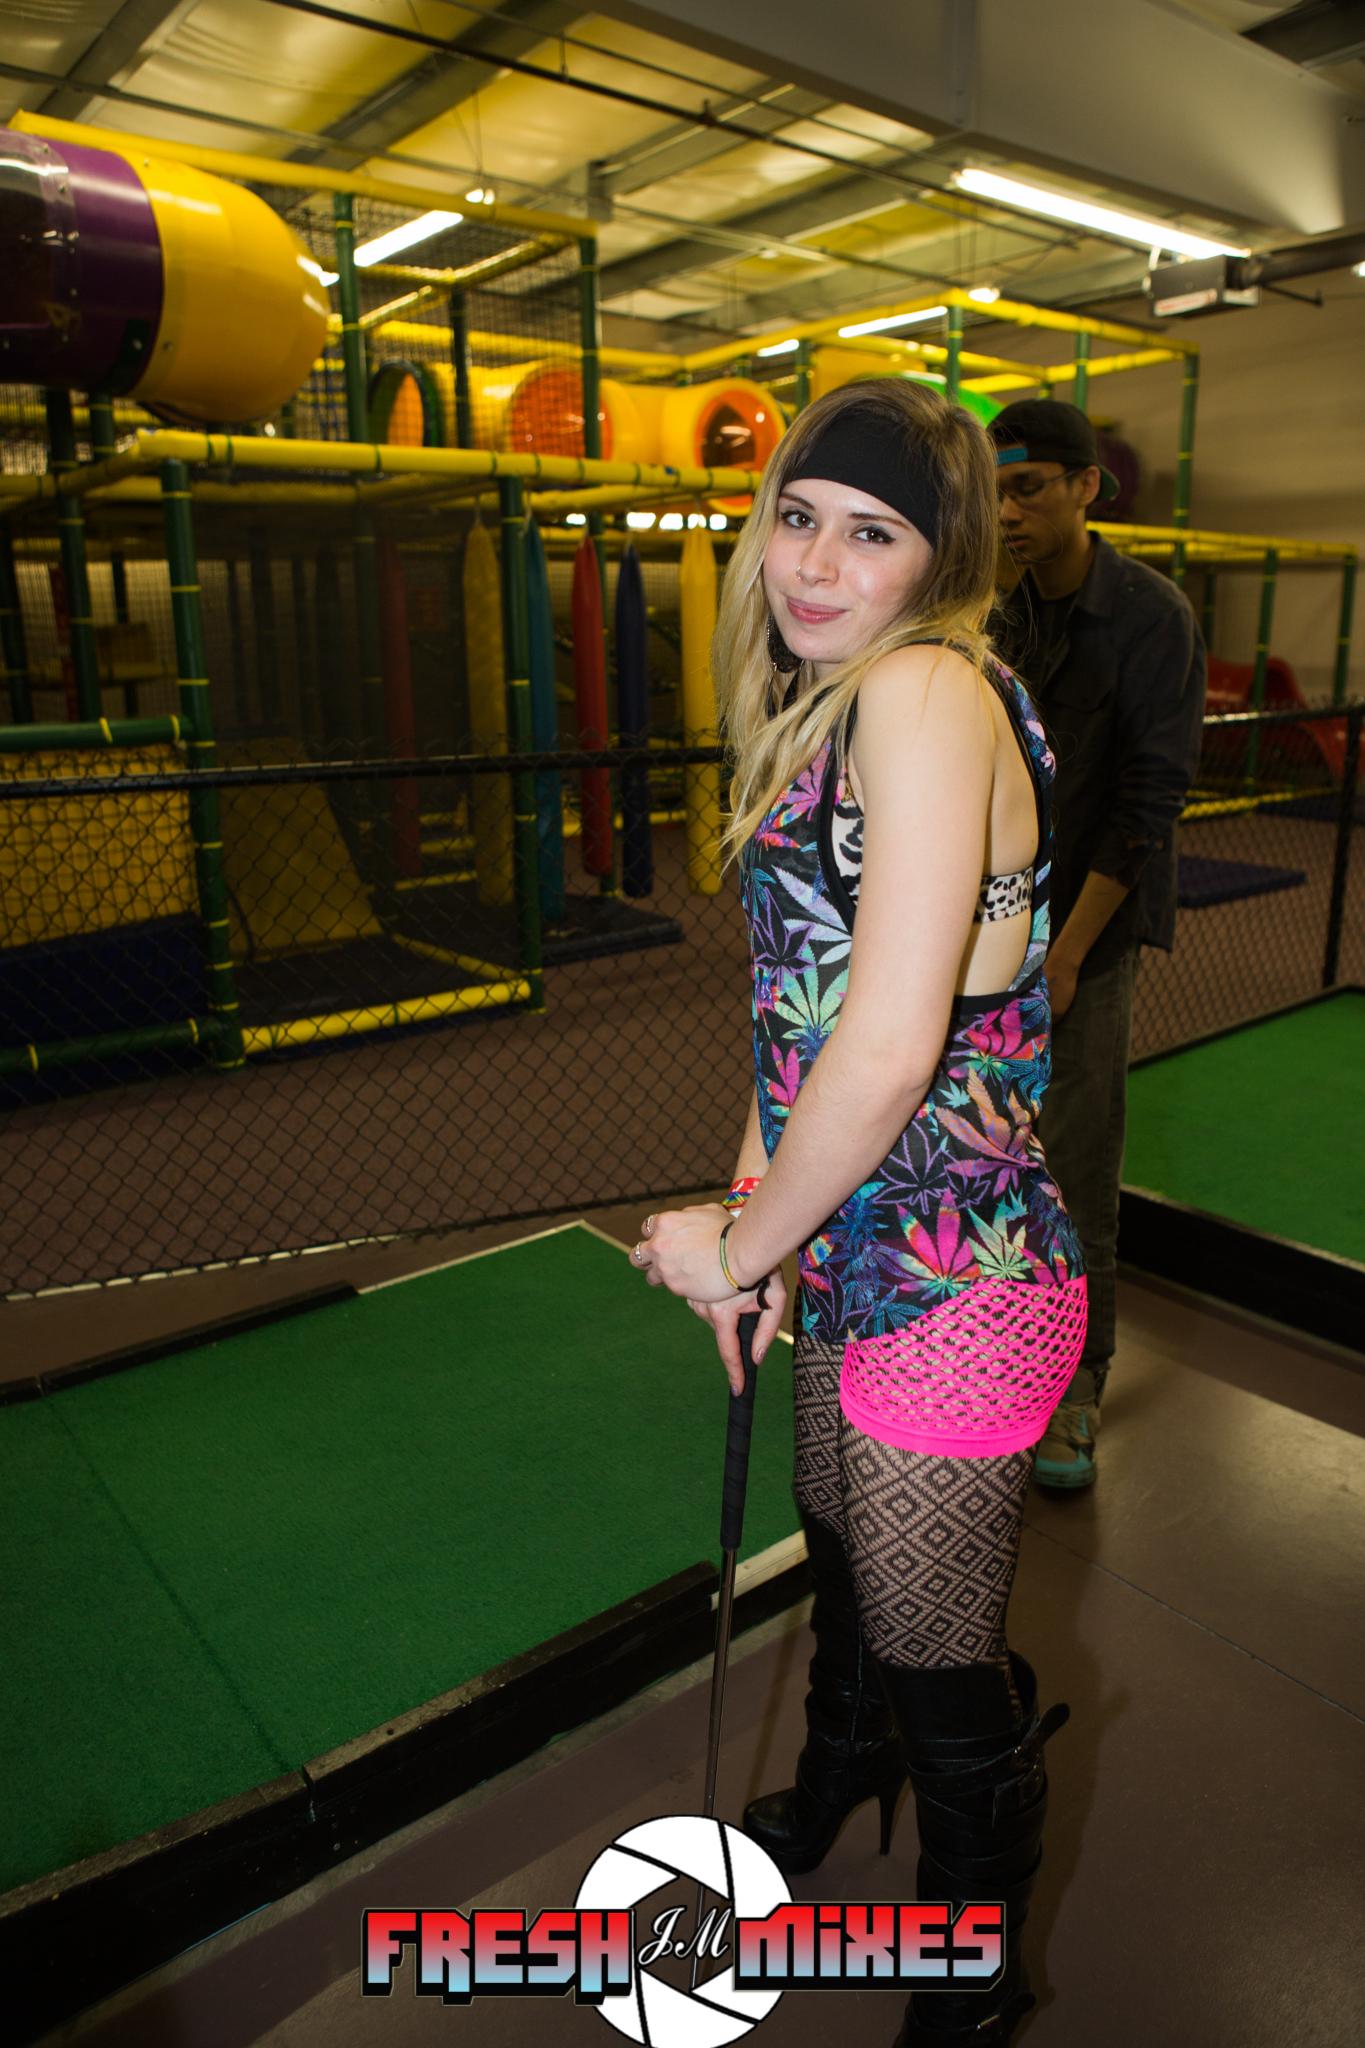 G-Matyas-Jenna-_73A0834-.jpg